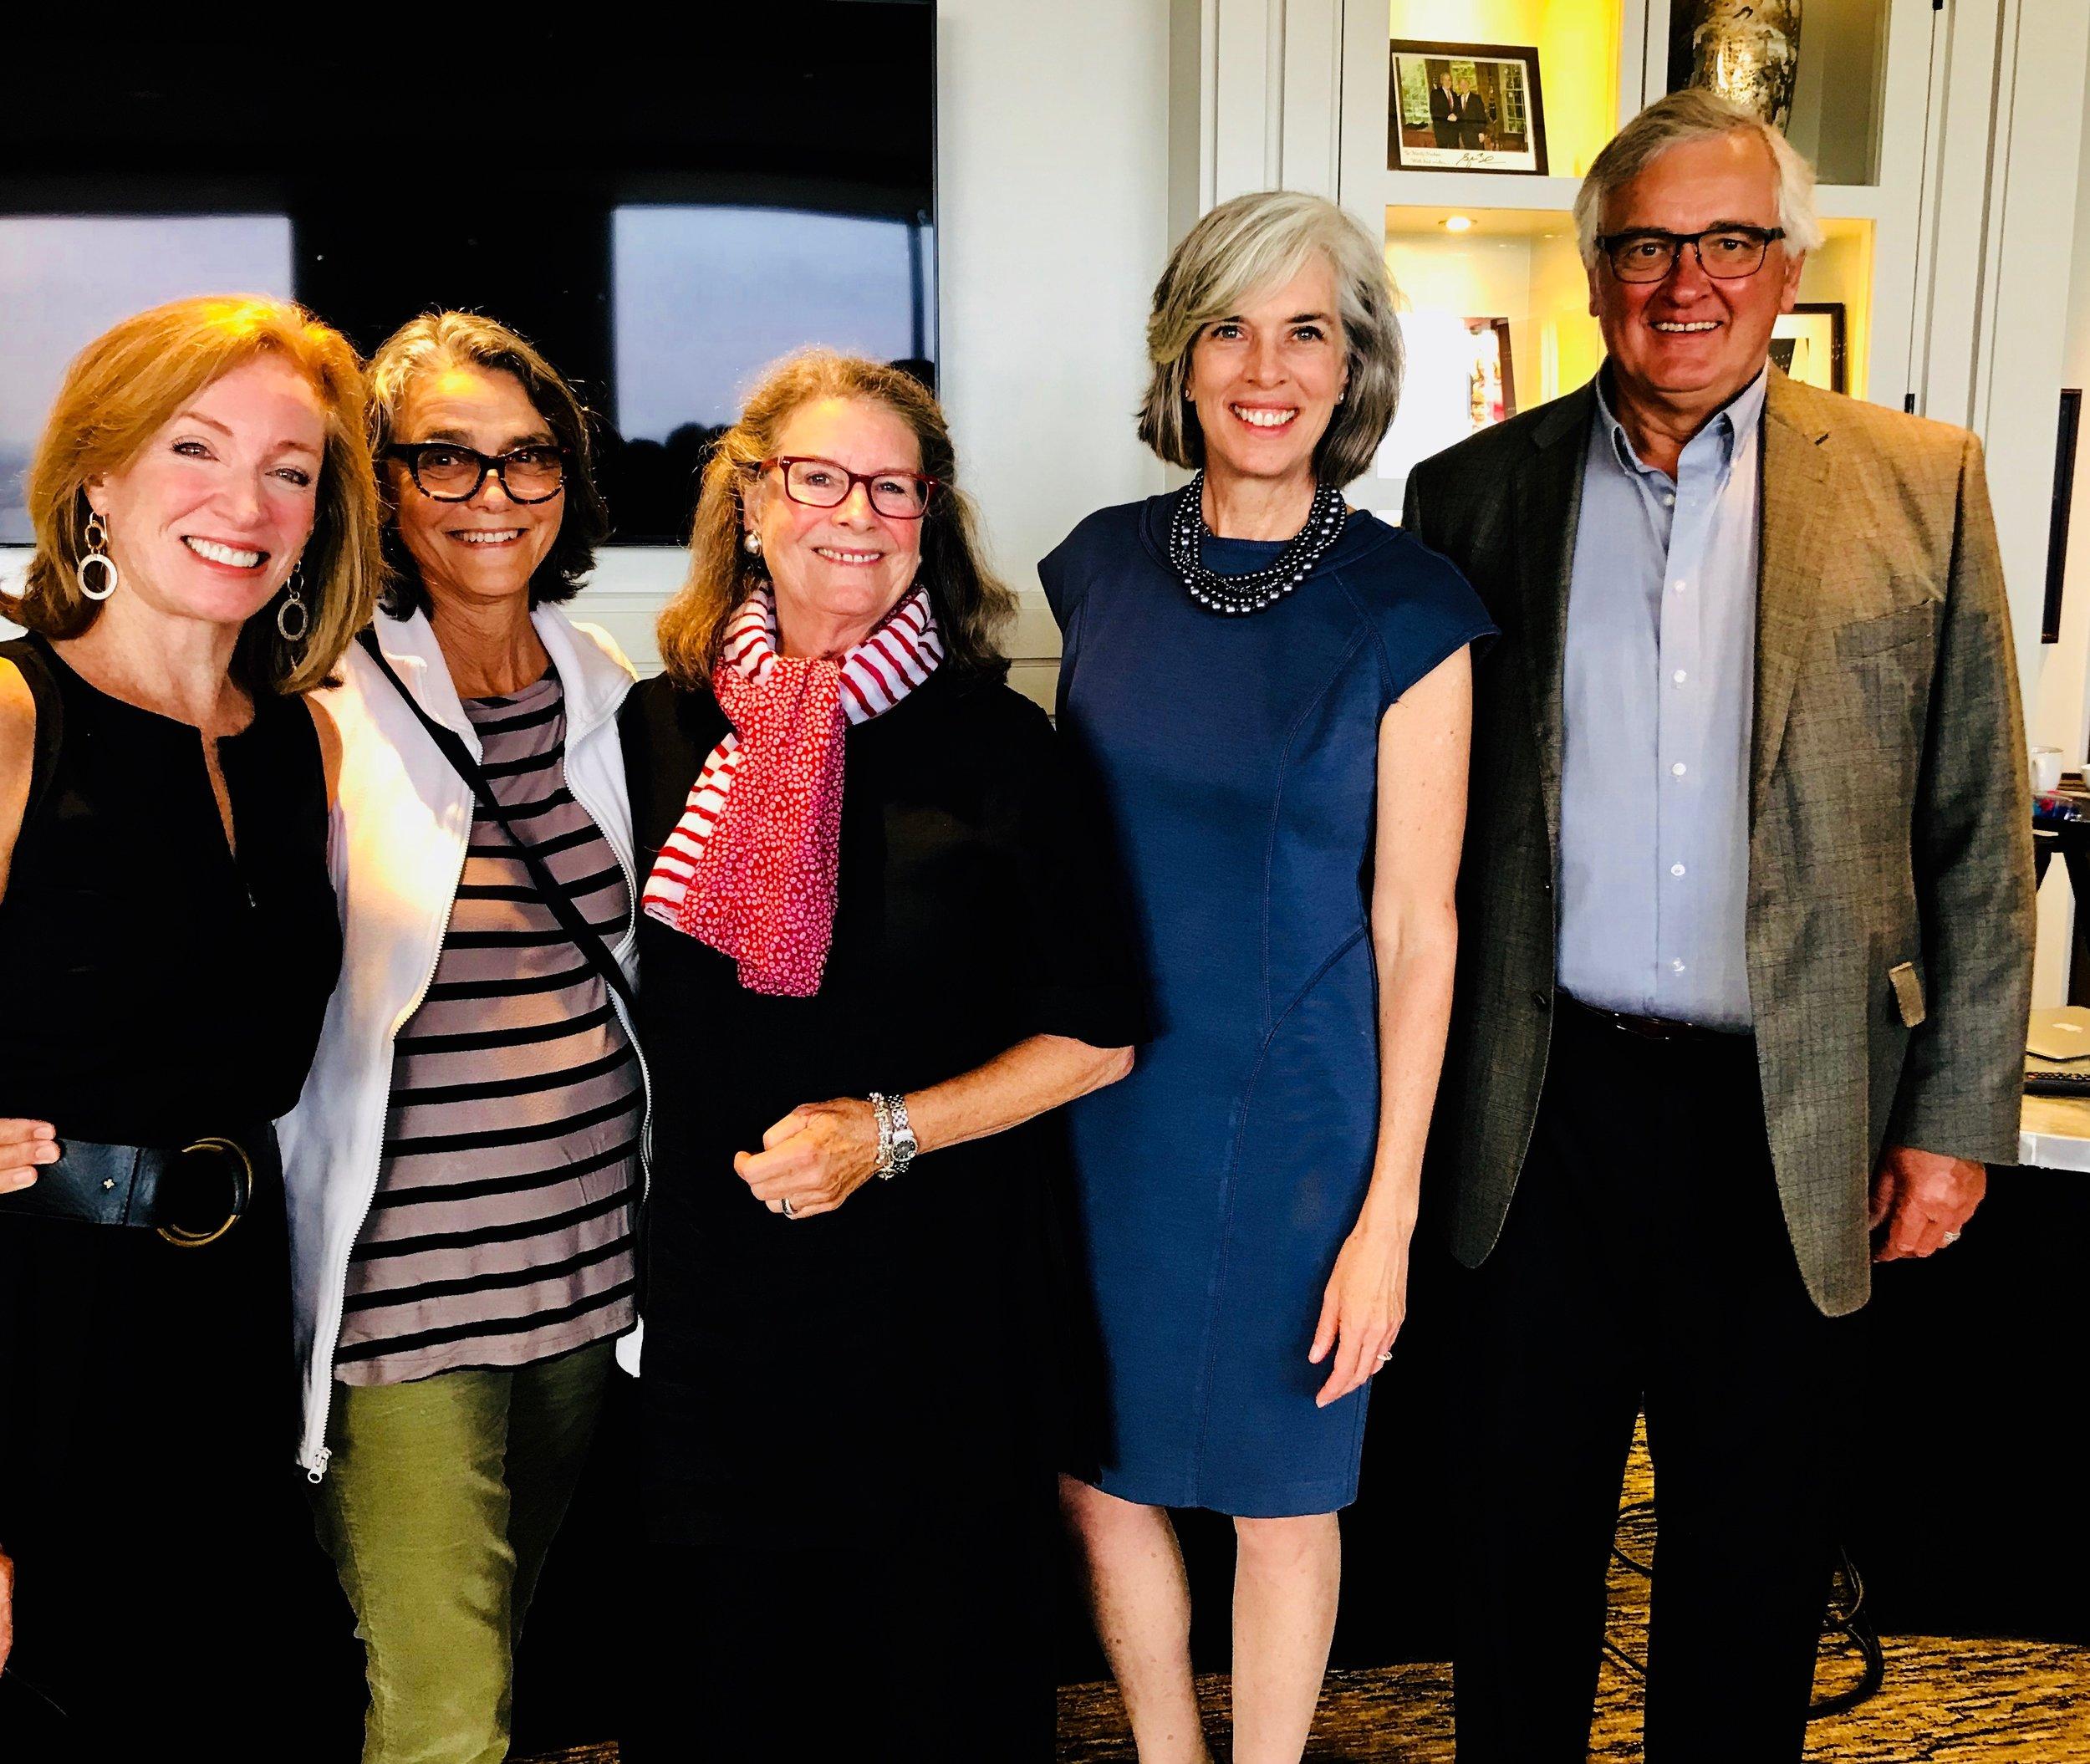 Pattie Garrahy Robertson, Nancy Train Smith, Laurie Bullard, Congresswoman Katherine Clark, MA 05, and John Bullard